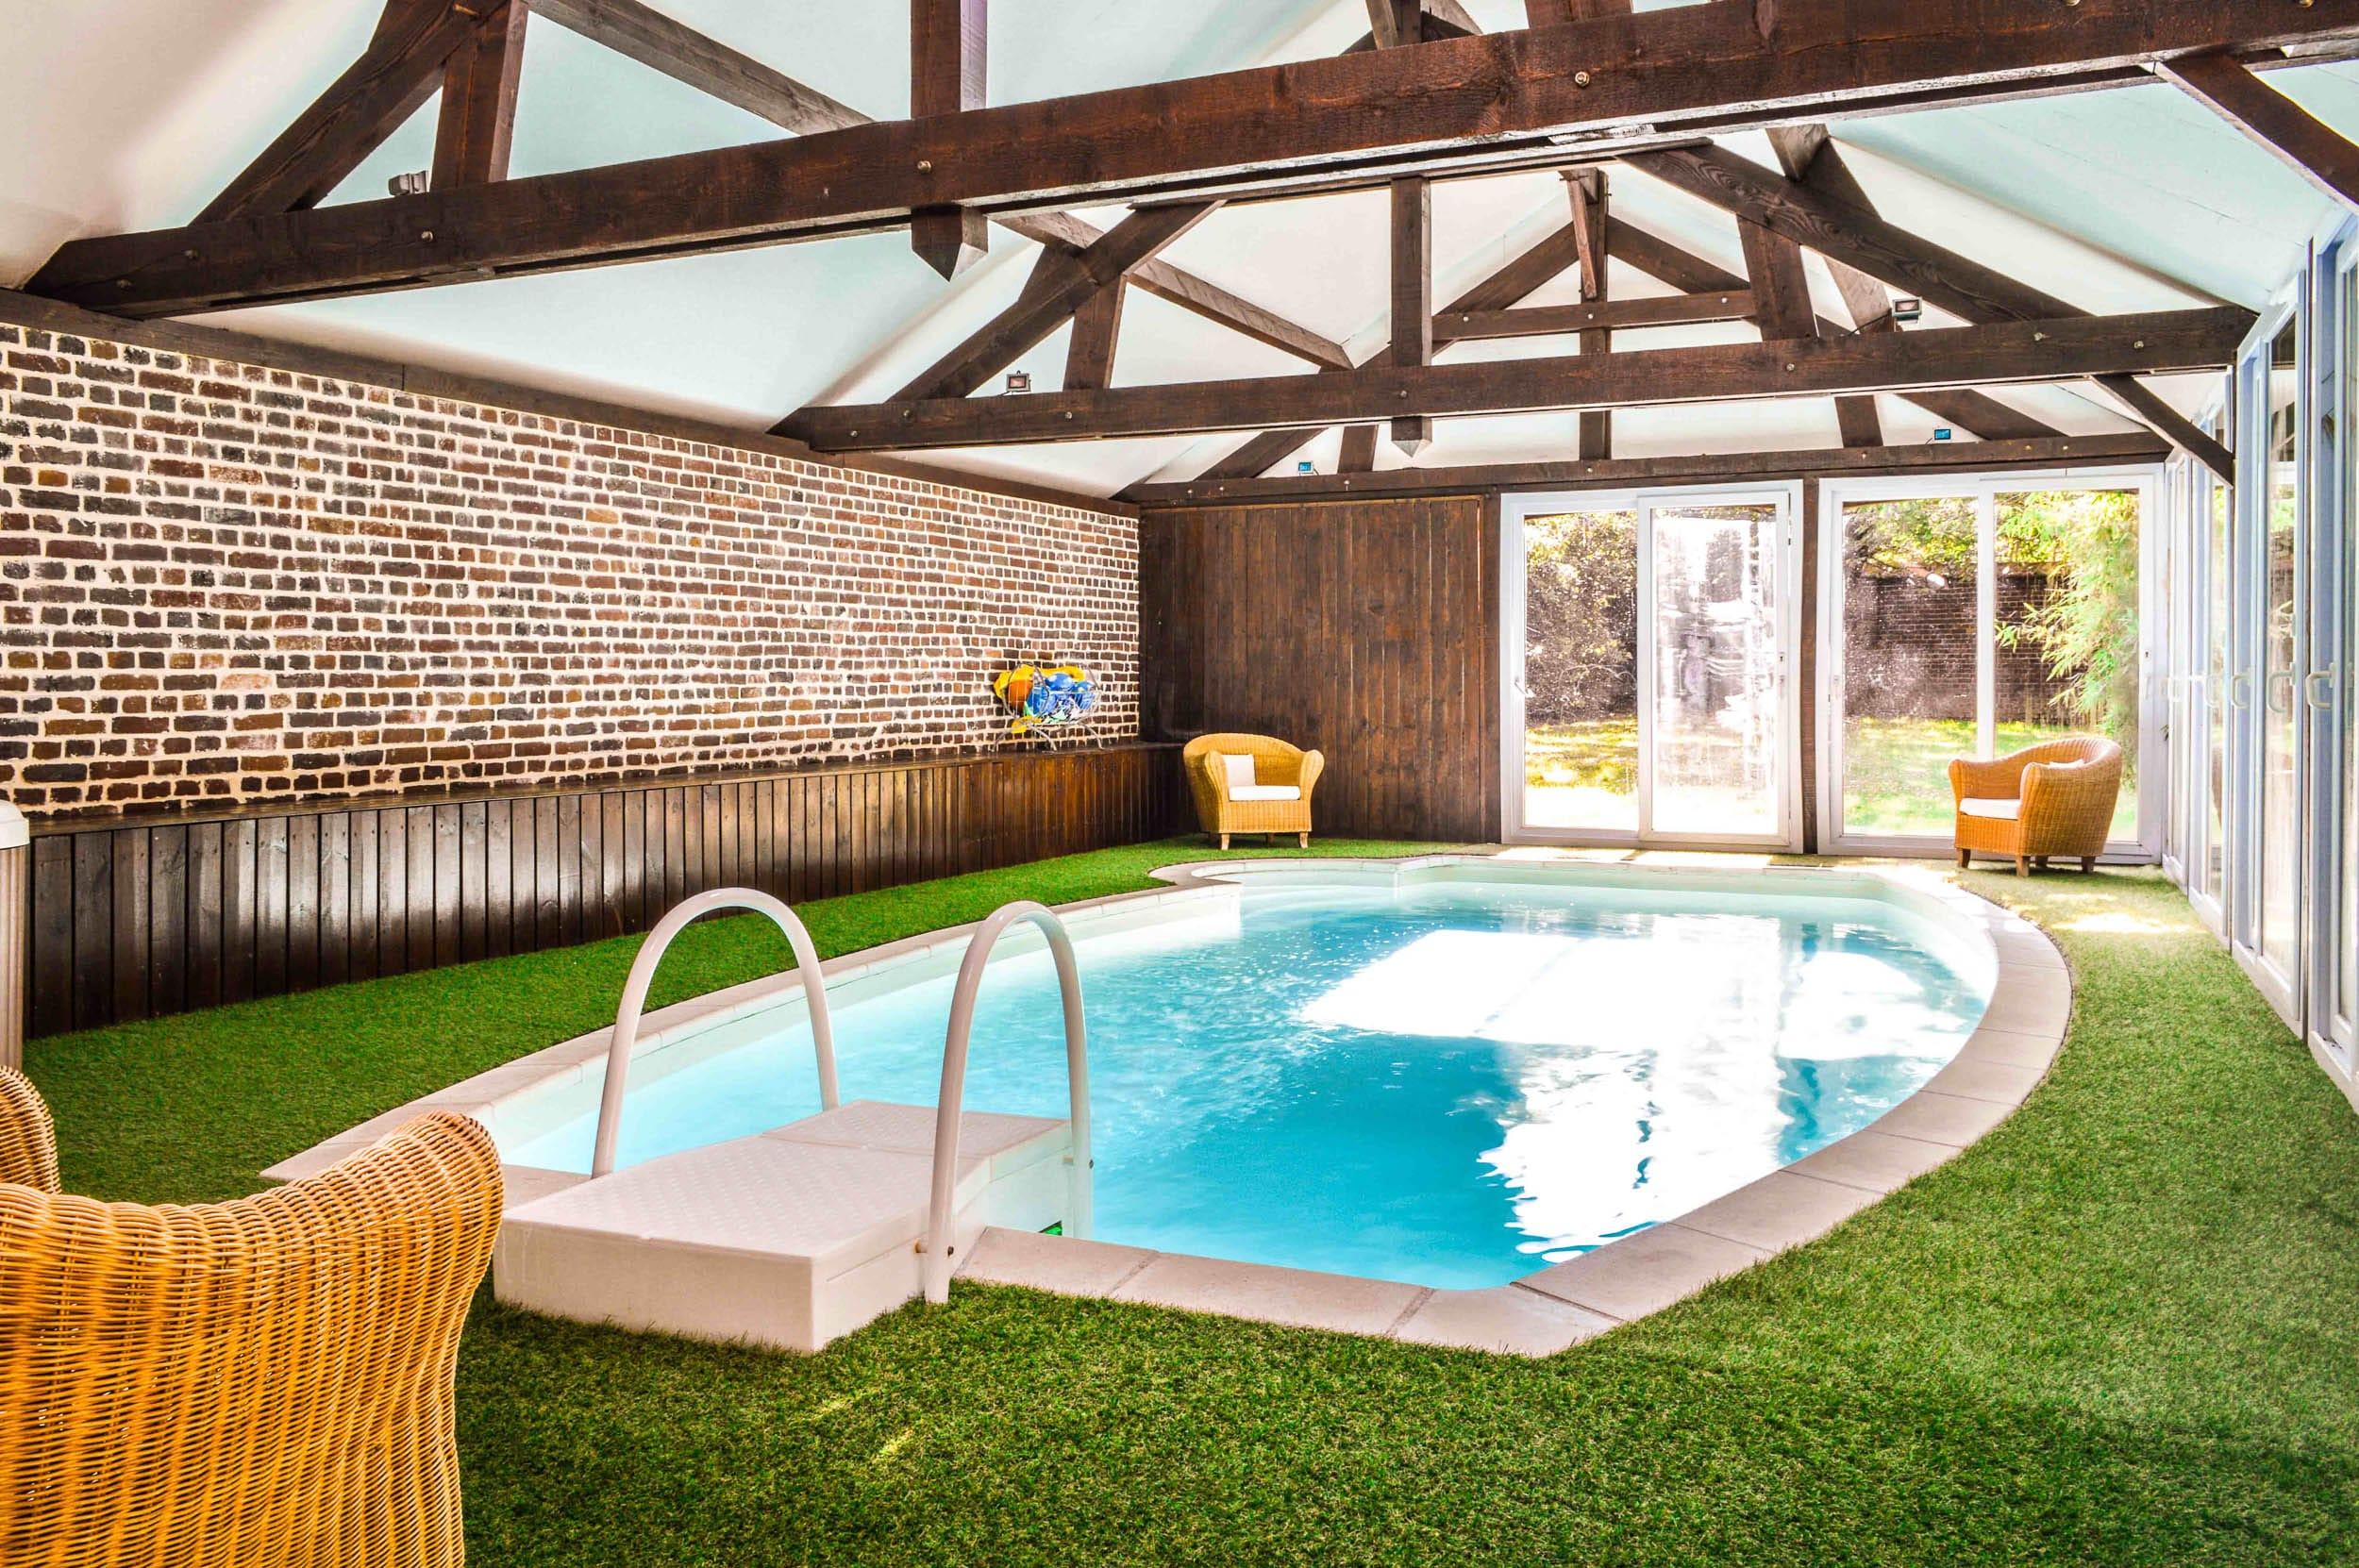 Hotel-Avec-Piscine-Meru-Les-Granges-Haillancourt-1-2 • Les ... pour Piscine Meru